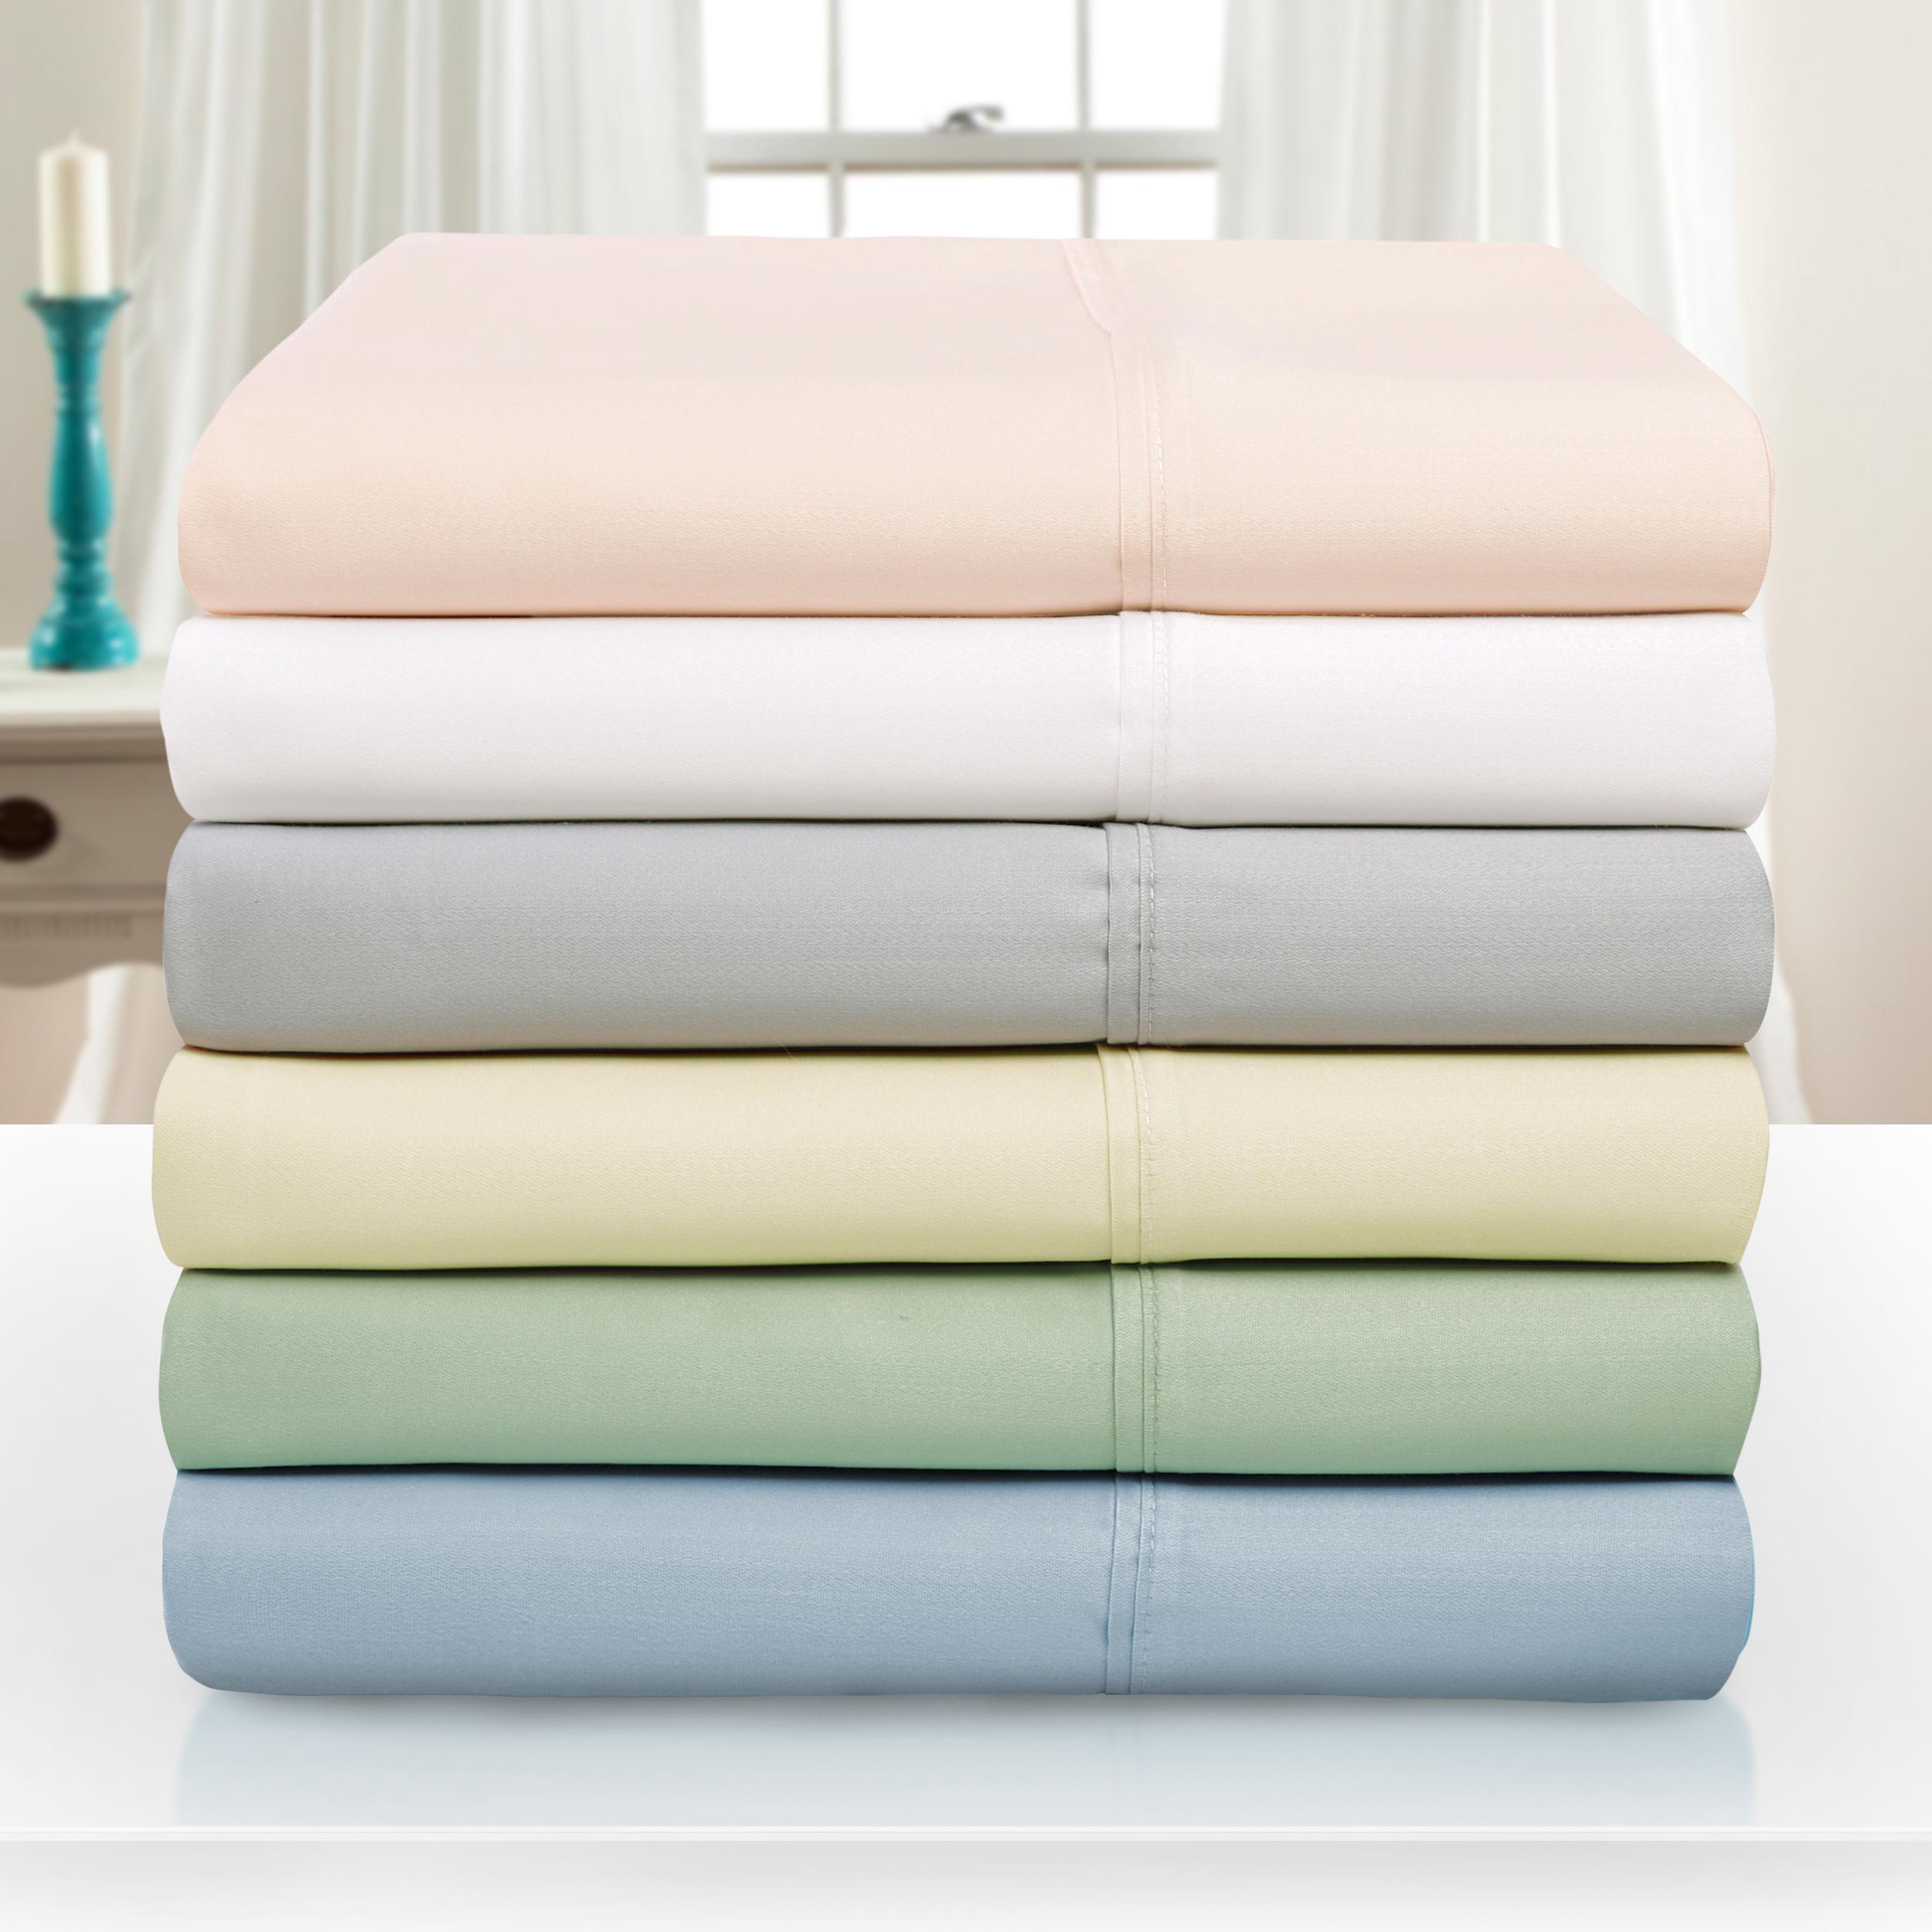 1000 thread count tencel polyester ultra soft bed sheet set 6 colors. Black Bedroom Furniture Sets. Home Design Ideas